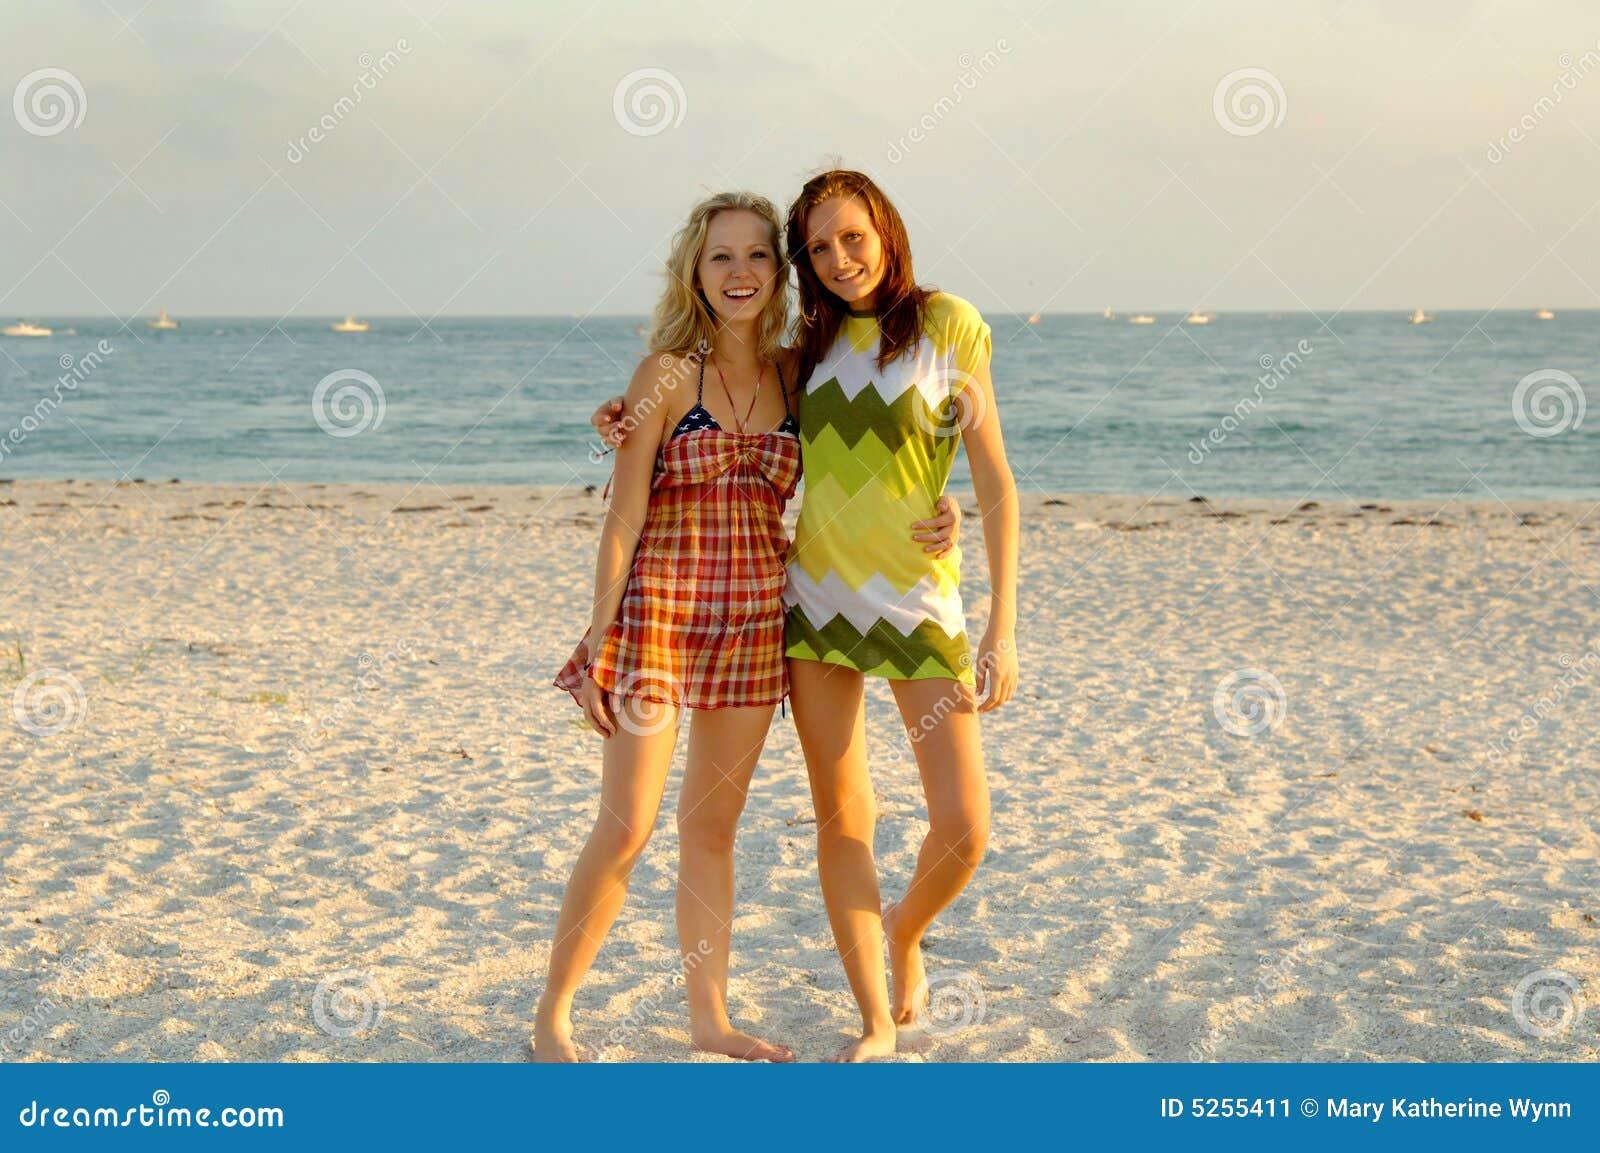 Strandparty jugendlich Strand